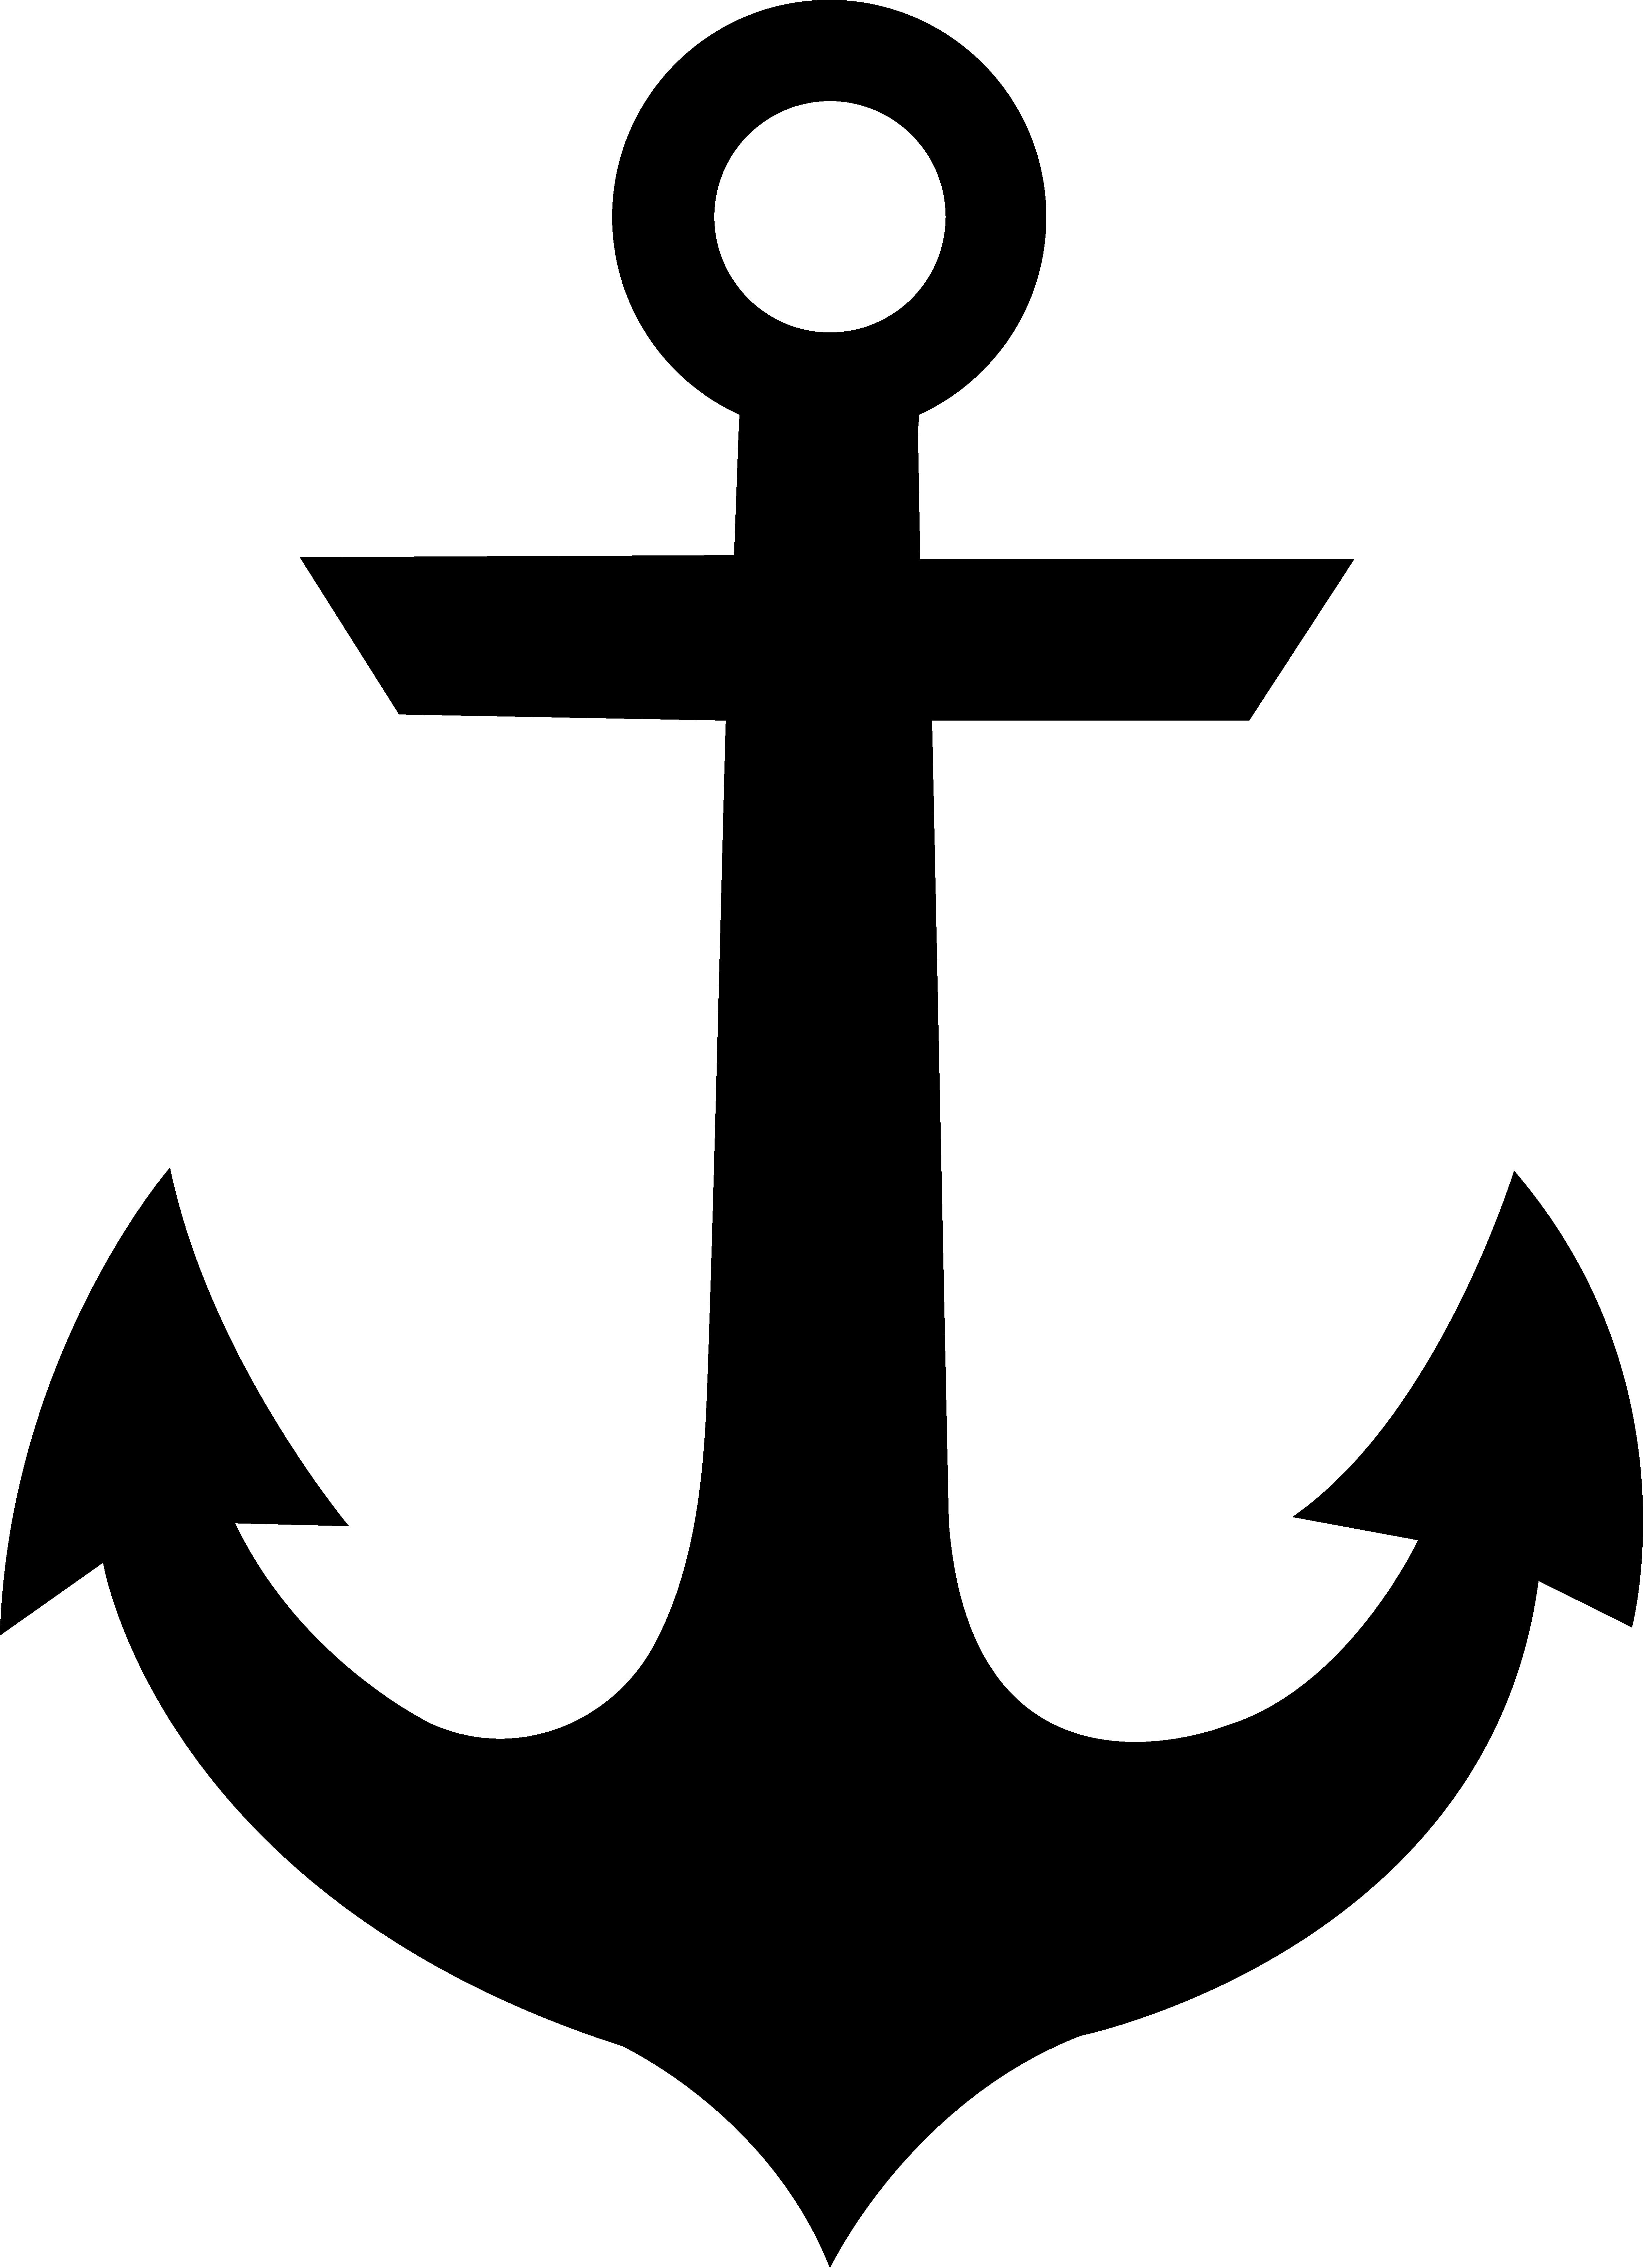 Clipart anchor free transparent Black Anchor Silhouette - Free Clip Art transparent